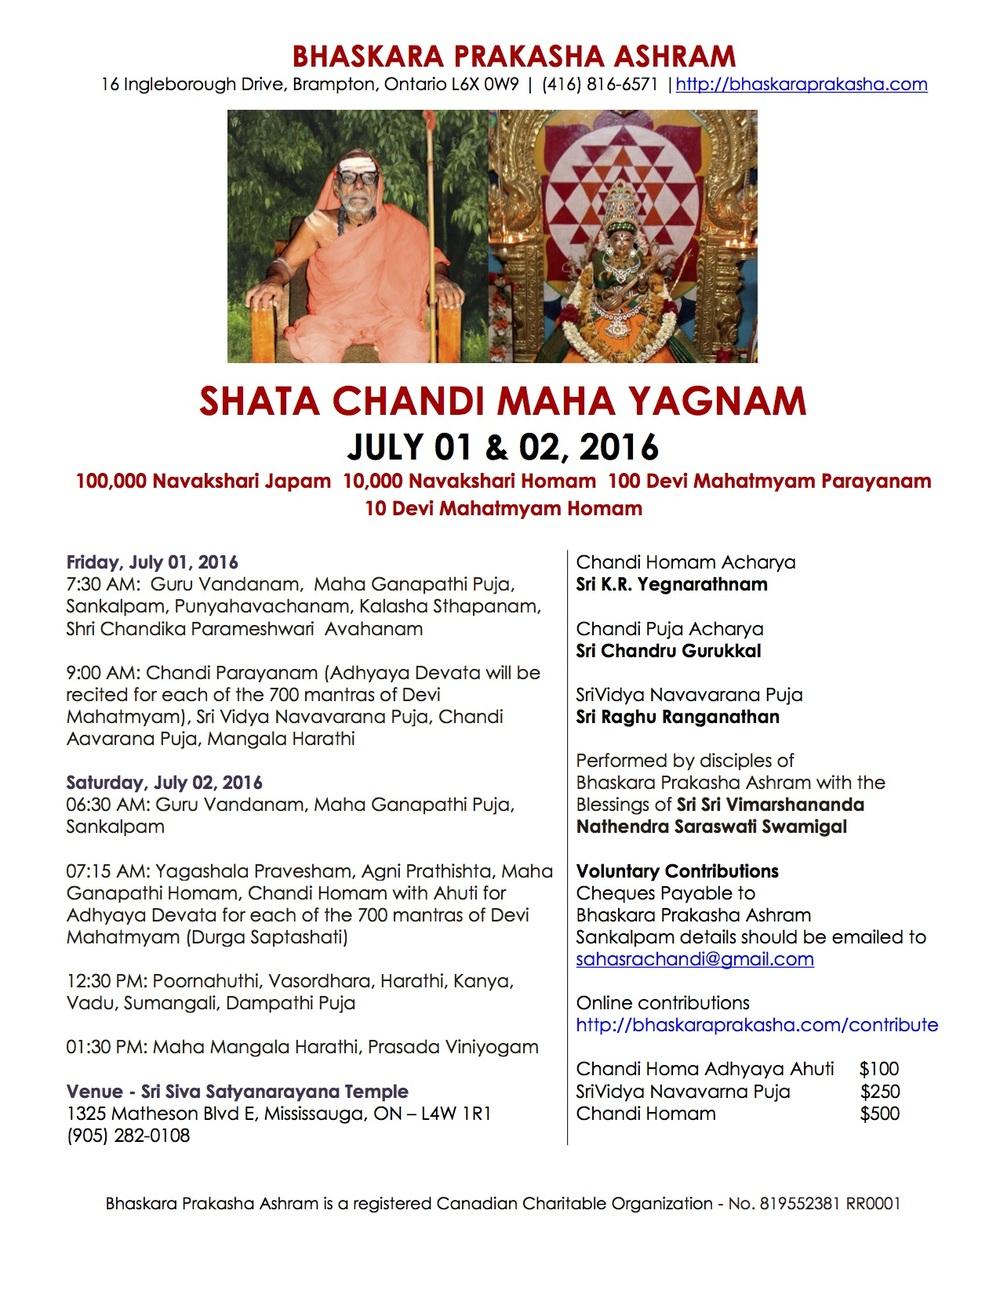 Shata Chandi Maha Yagnam 2016